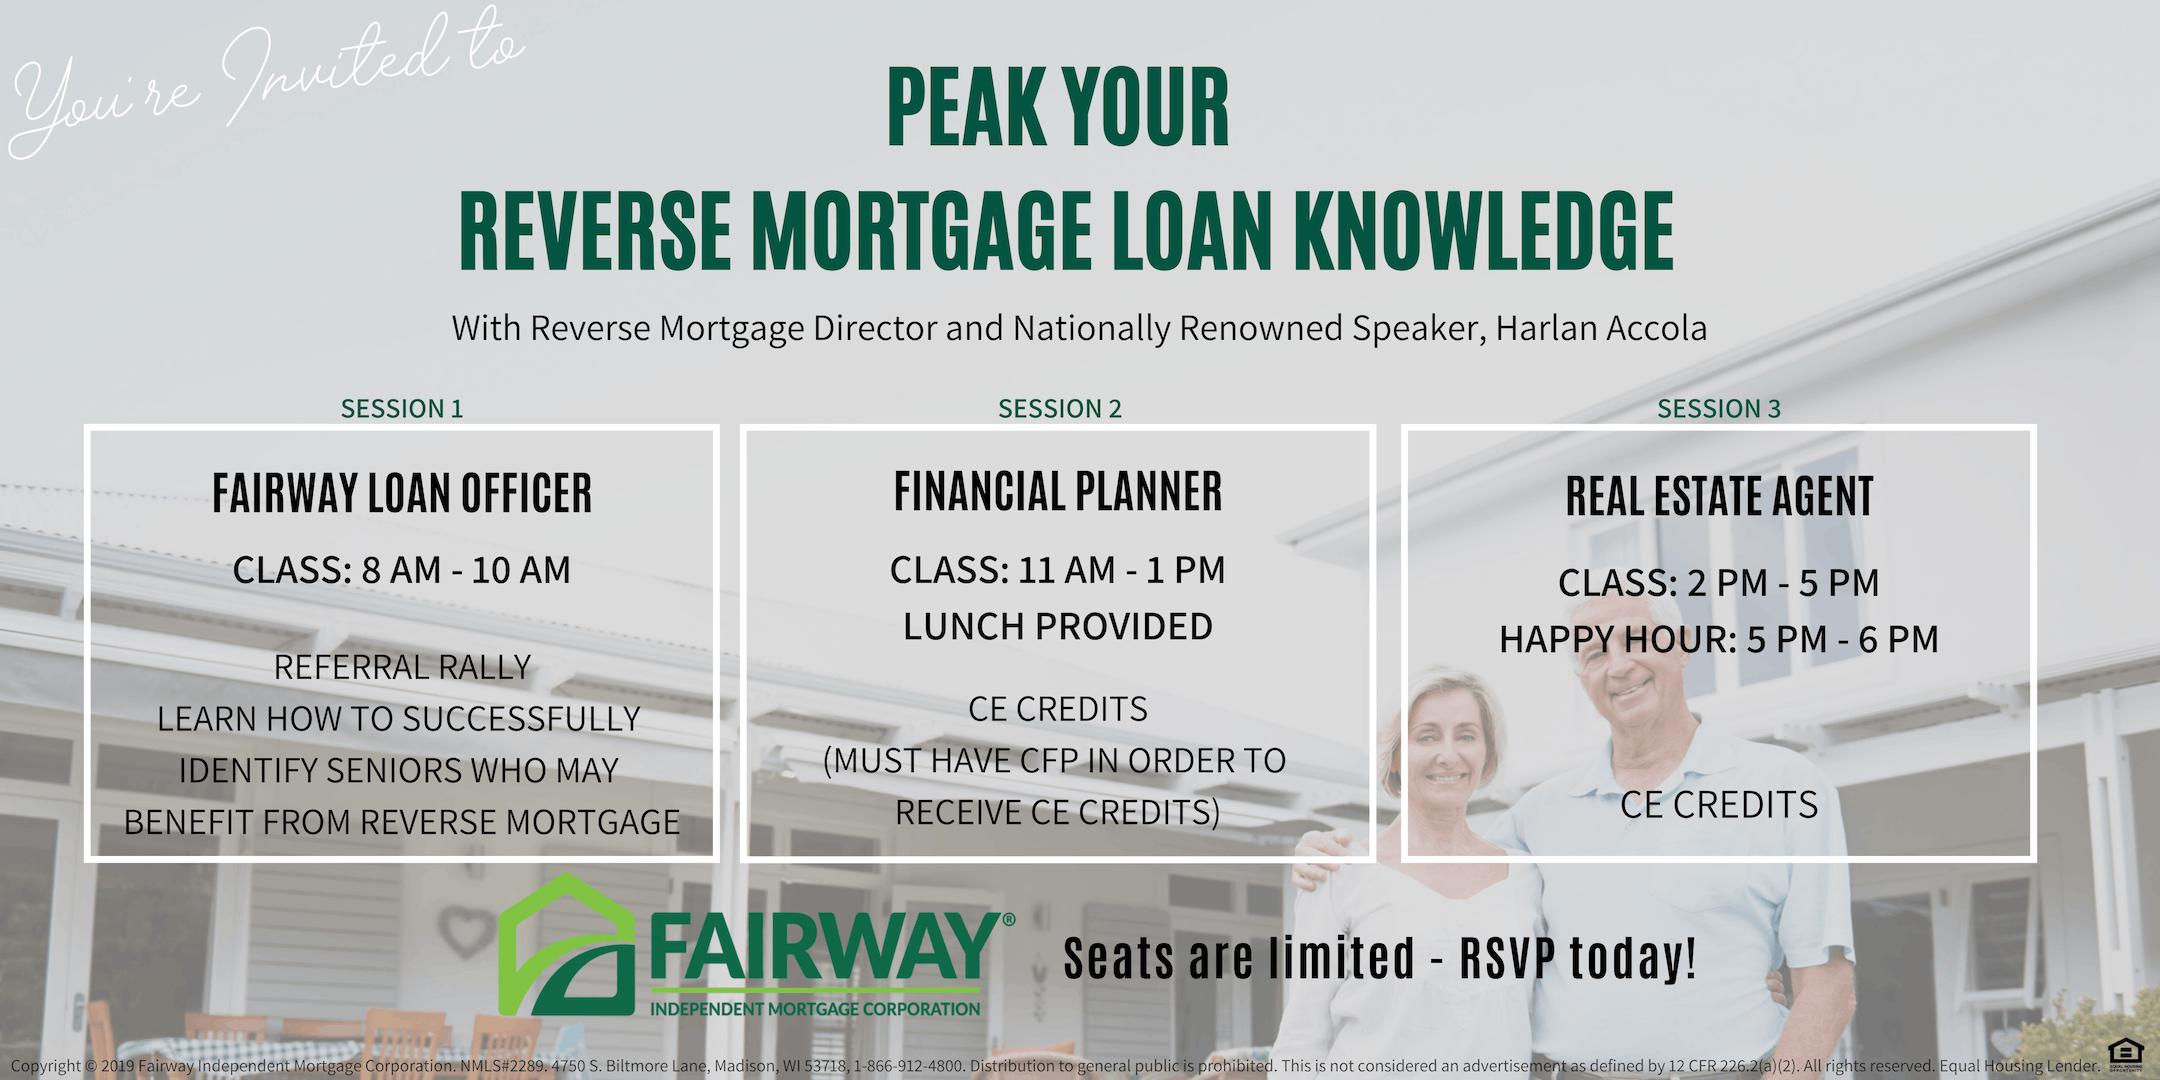 Peak Your Reverse Mortgage Loan Knowledge